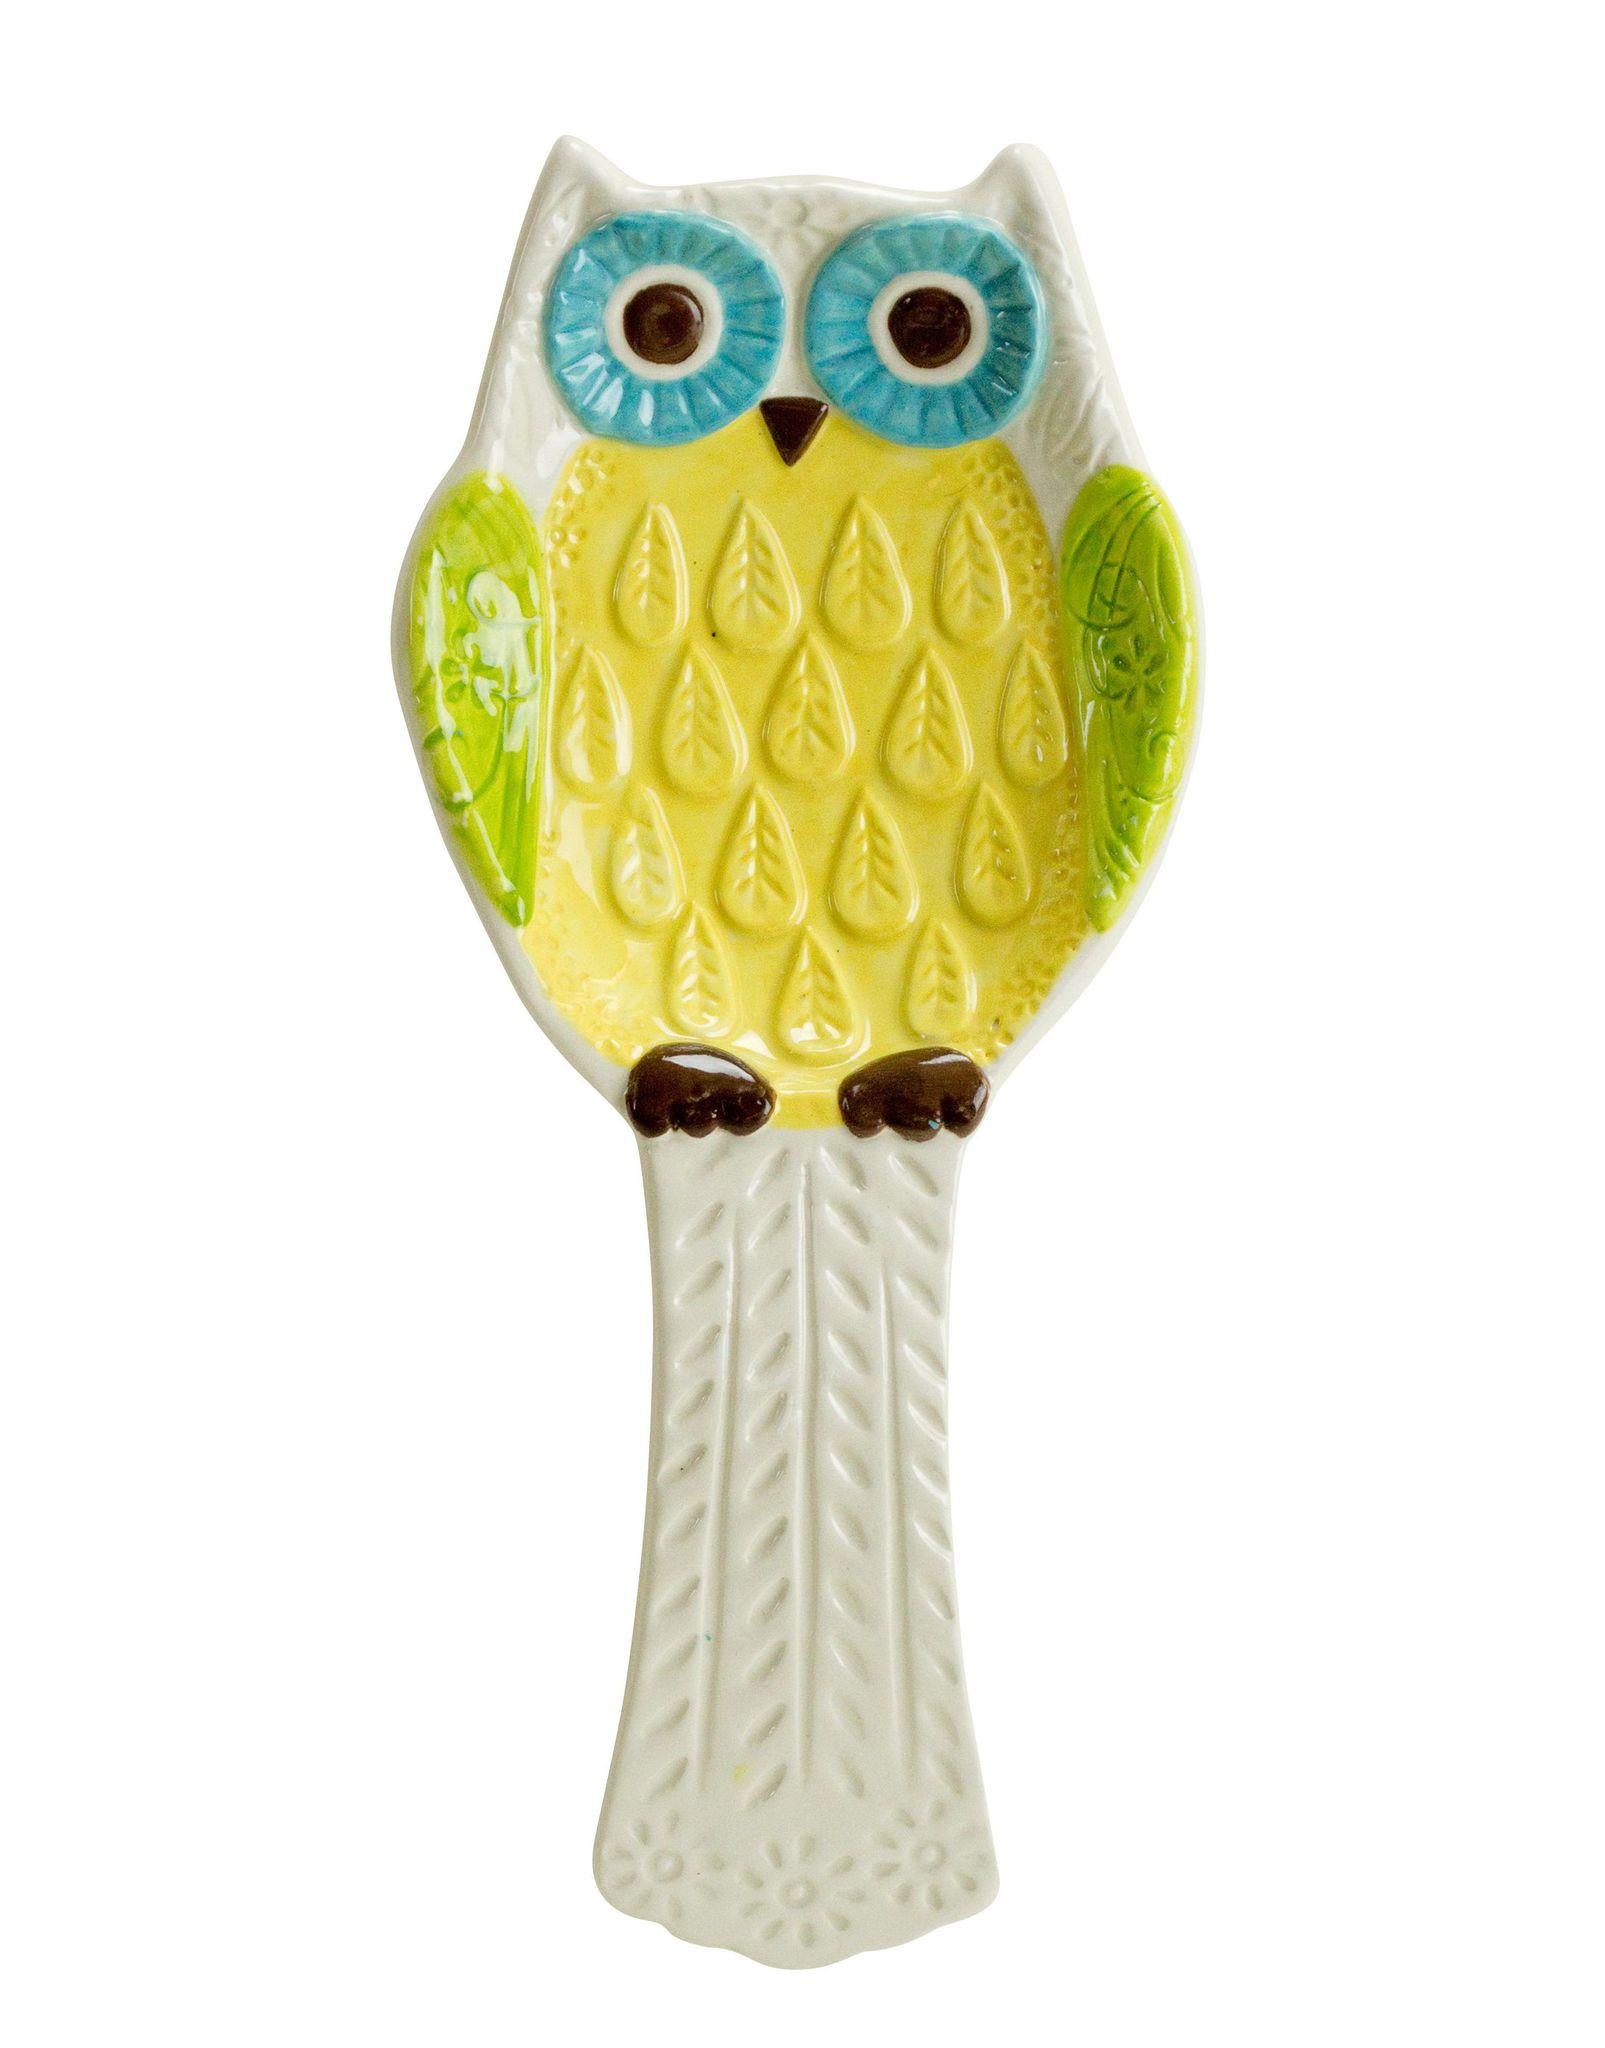 Кухня Подставка для ложки Boston Floral Owl podstavka-dlya-lozhki-boston-floral-owl-ssha.jpg